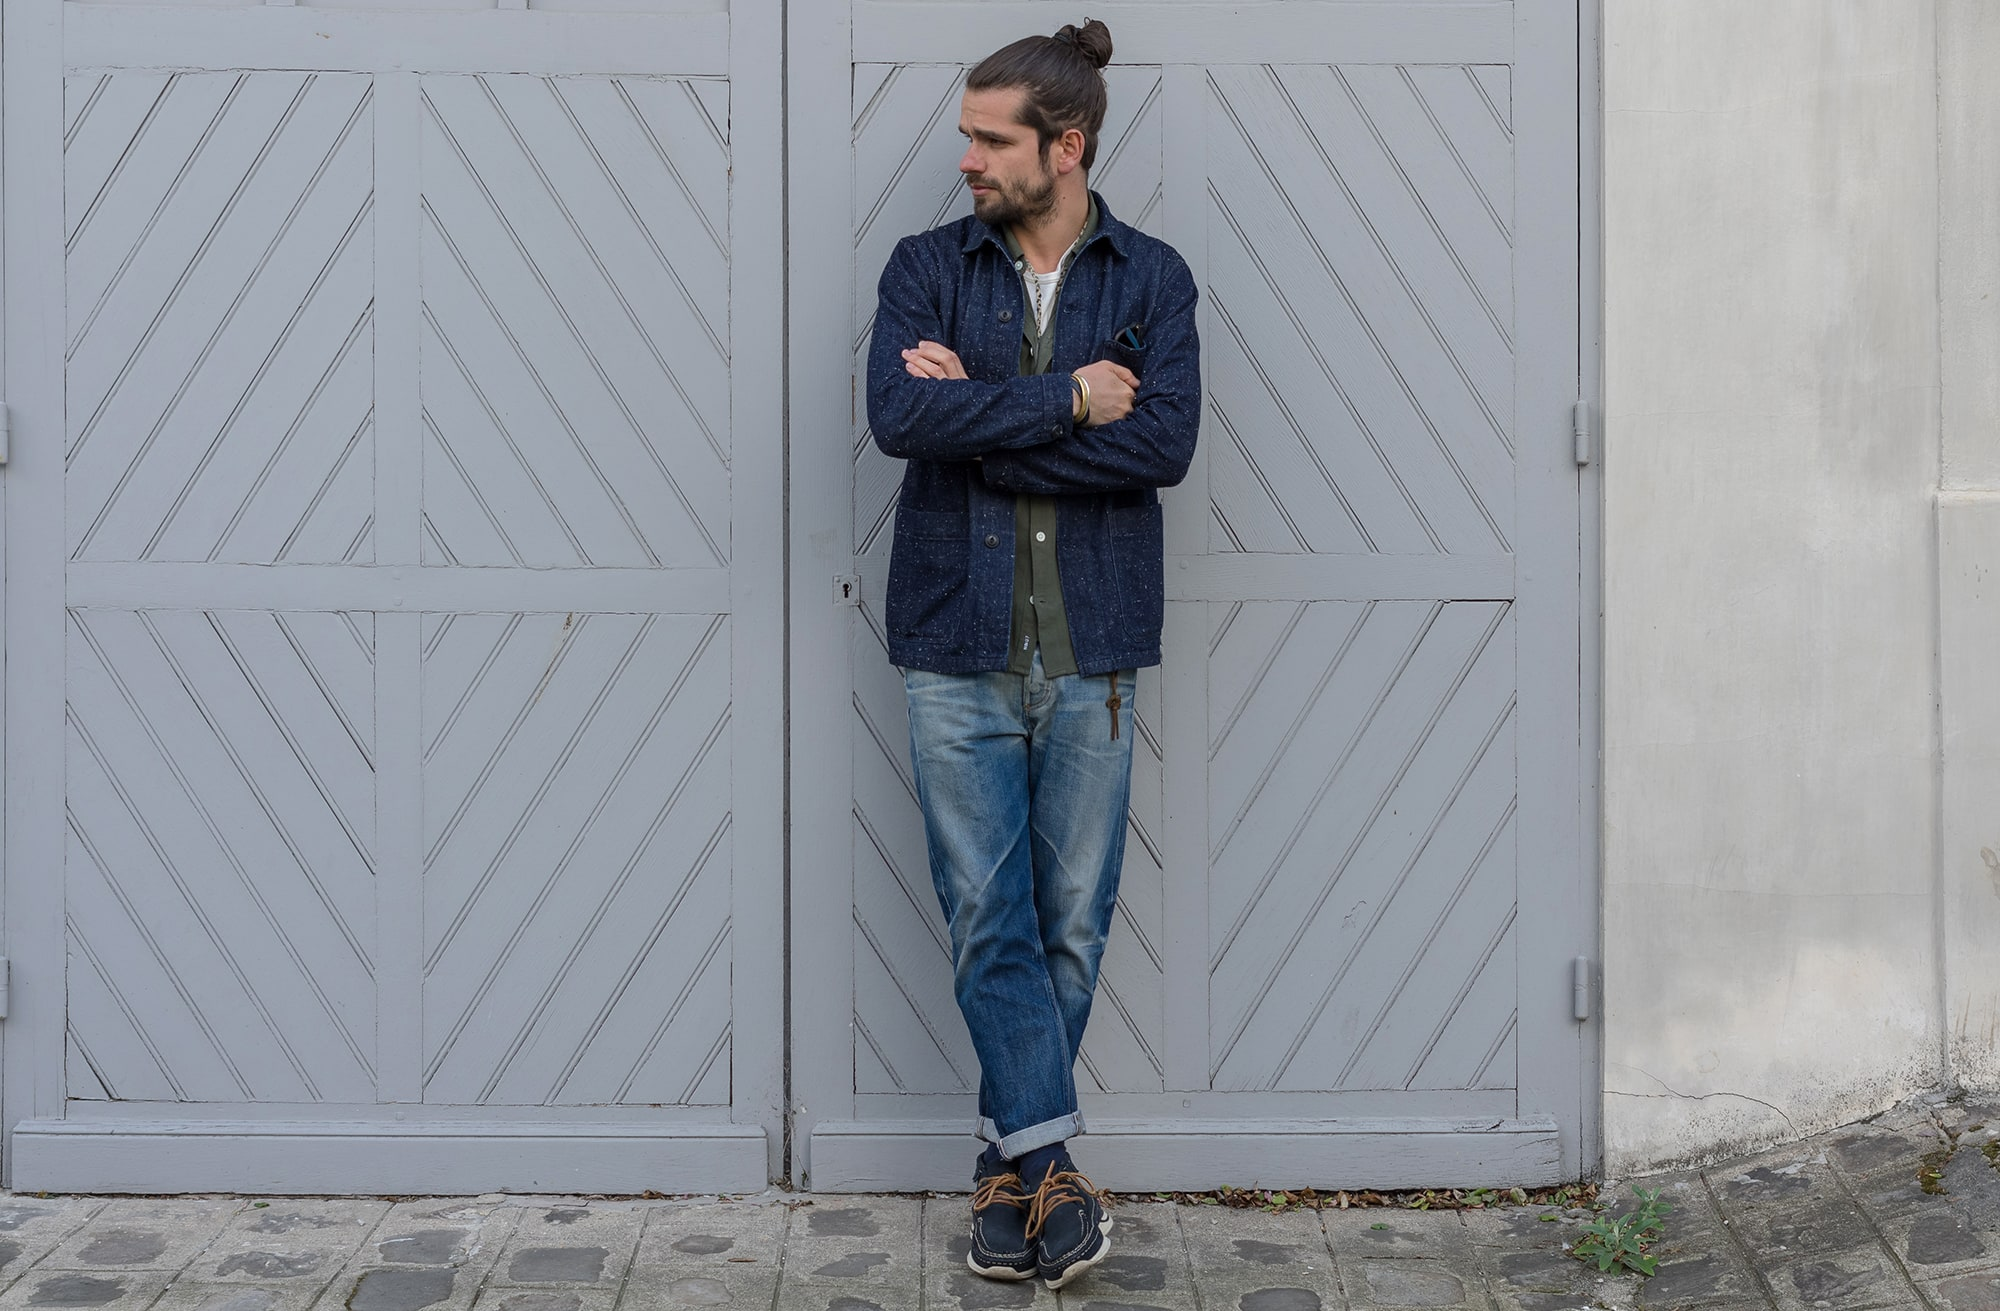 blog mode street heritage homme - Bonne gueule neppy veste -NN07 exclusif frenchtrotters alberto shirt - Borali necklace - maison cornichon tee - visvim voyager moc kicks